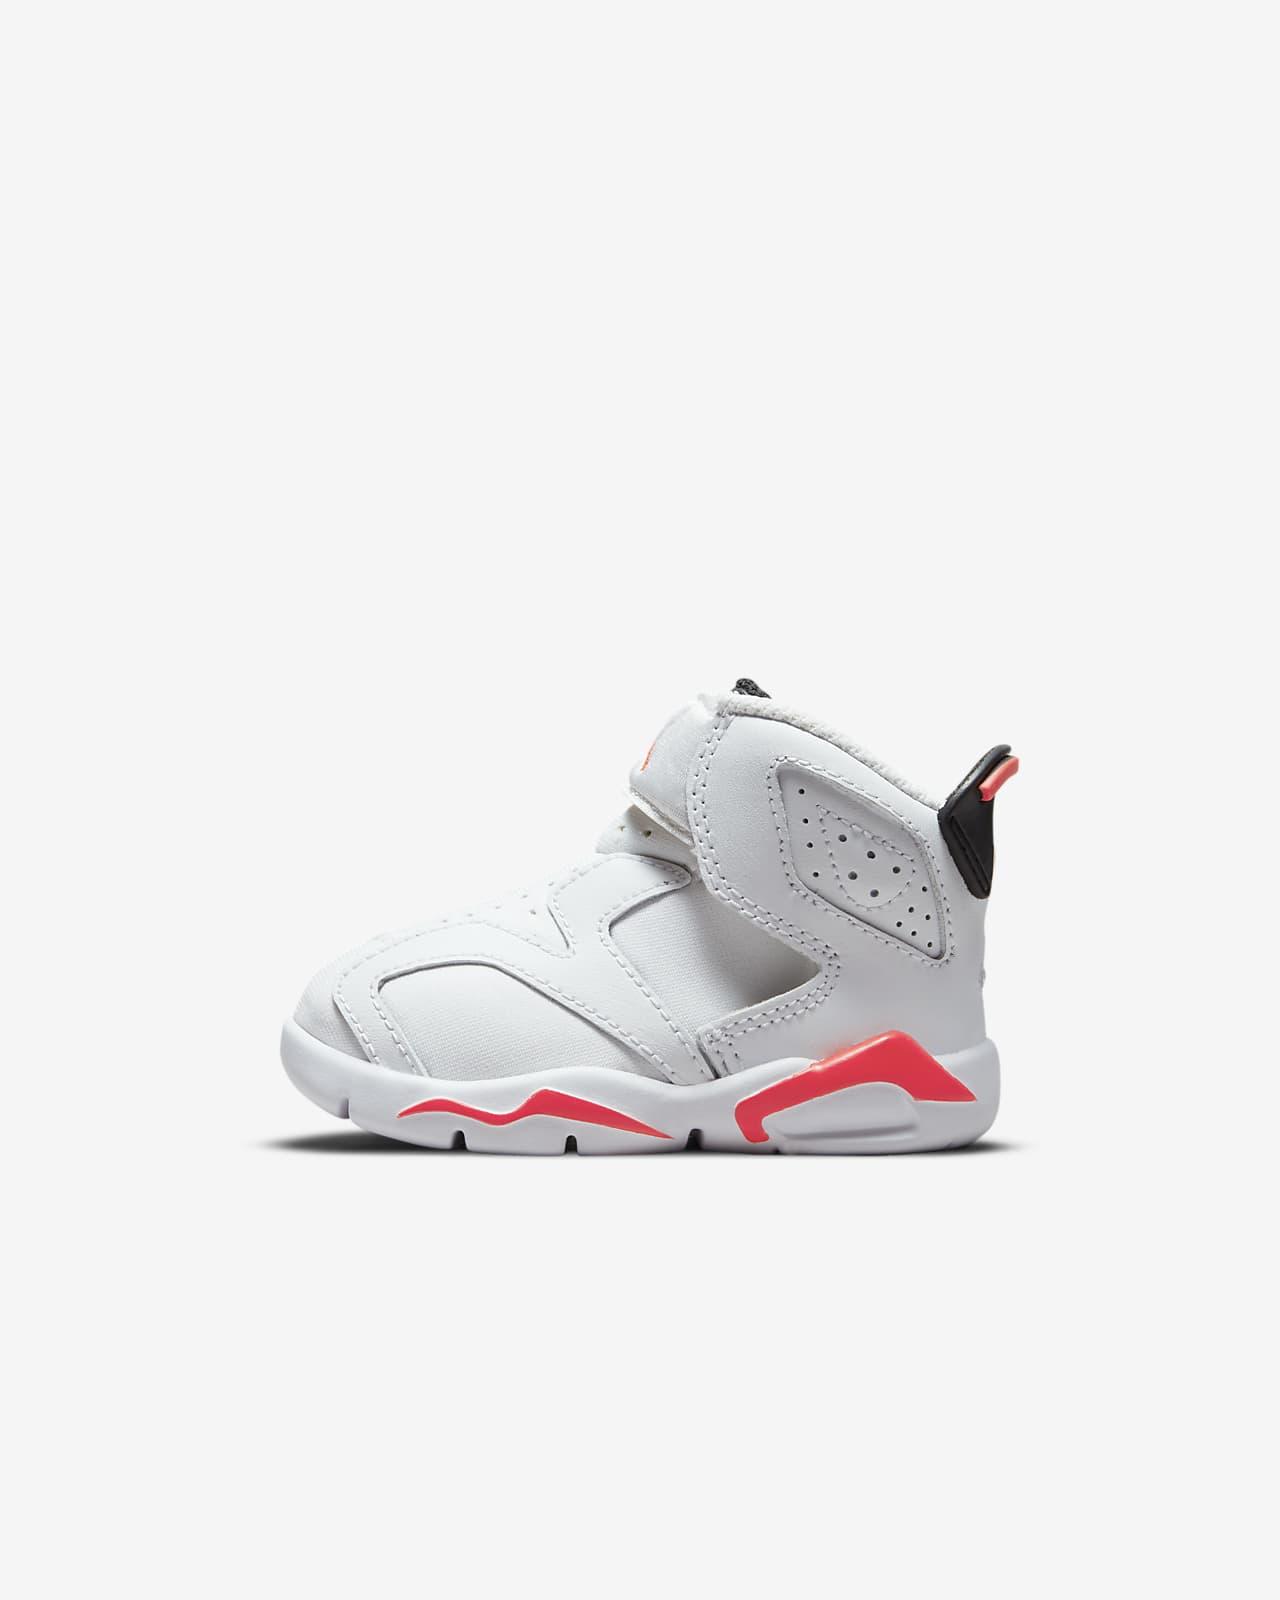 Jordan 6 Retro Little Flex Baby/Toddler Shoes